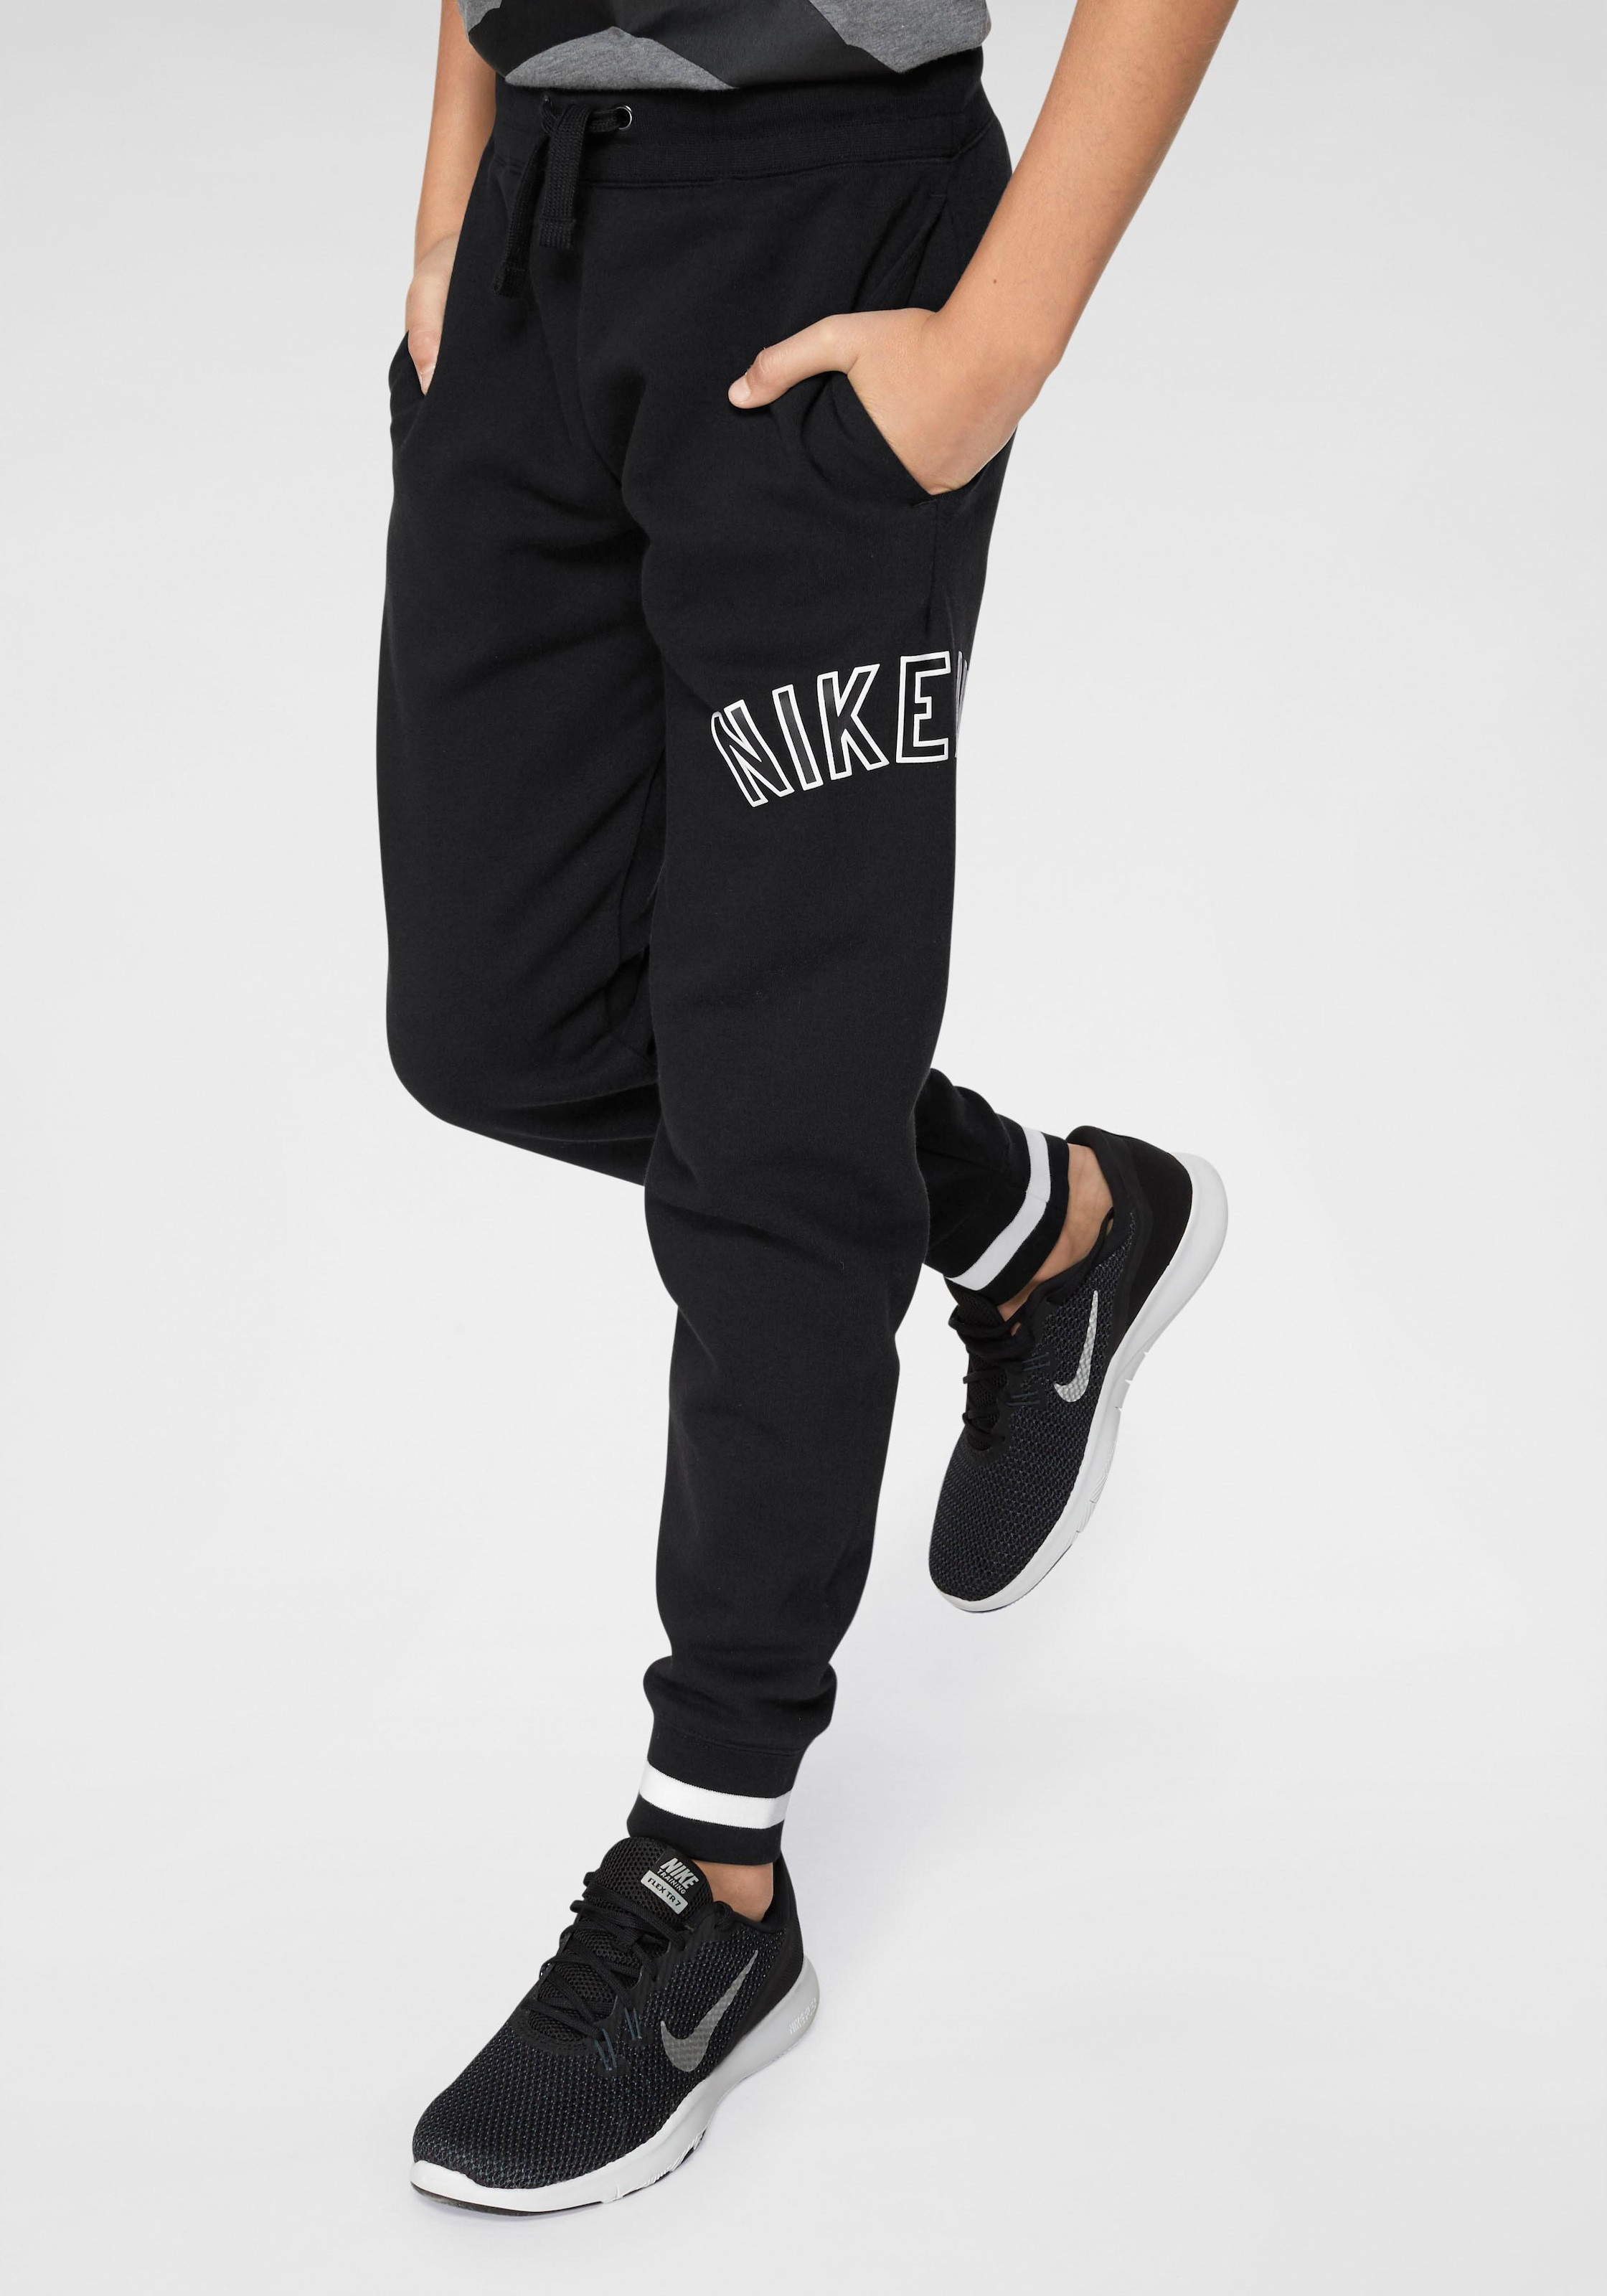 Nike Sportswear Jogginghose »BOYS NIKE AIR PANT« online bestellen | BAUR